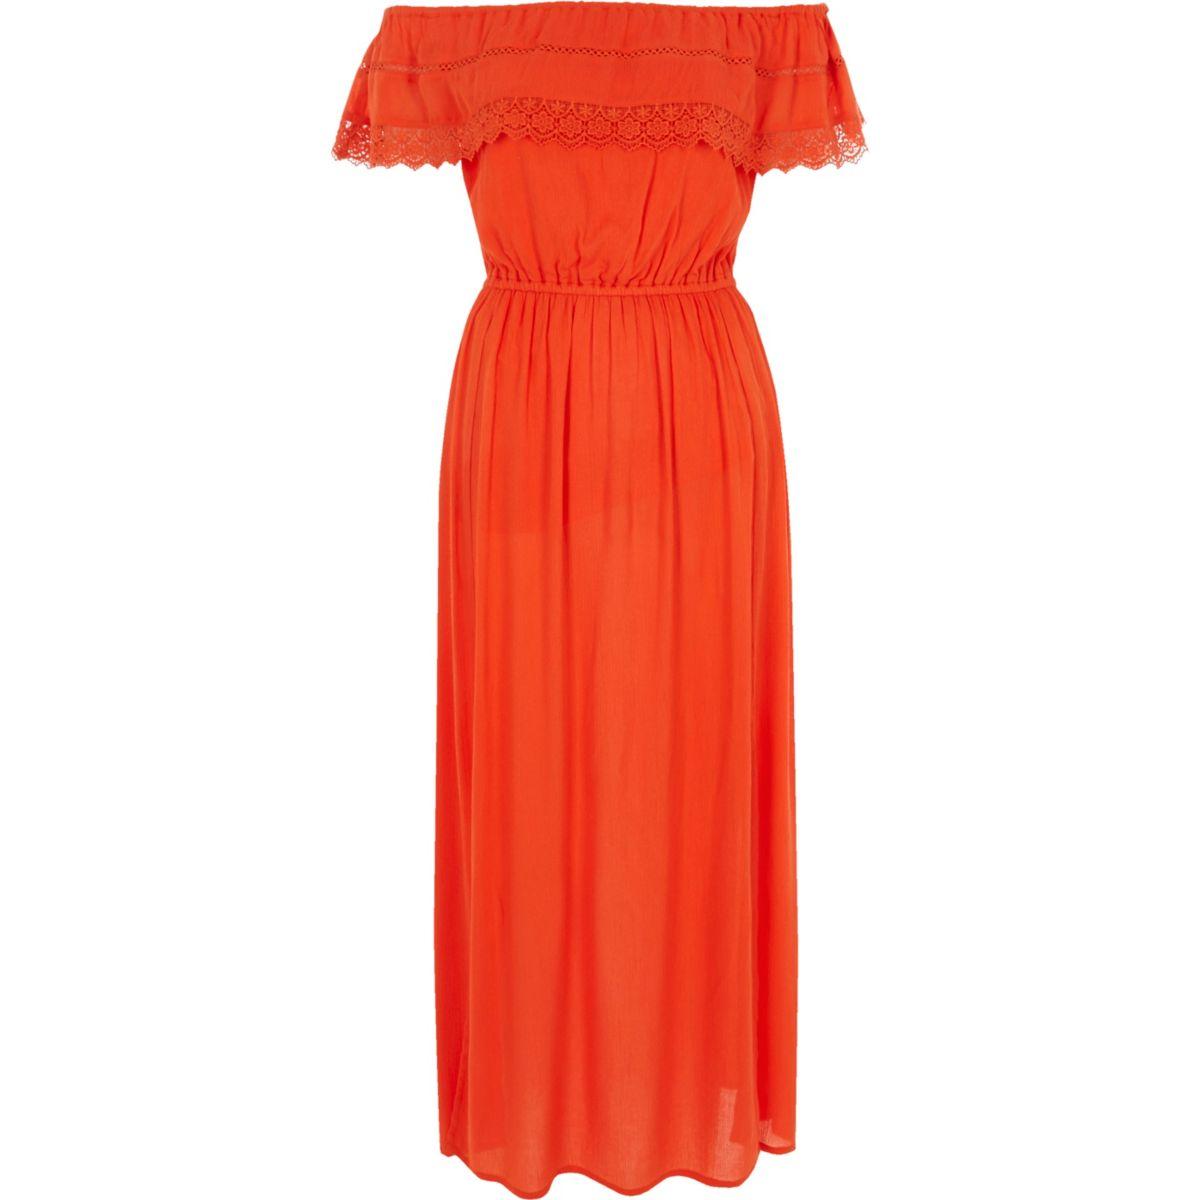 Orange bardot frill maxi dress